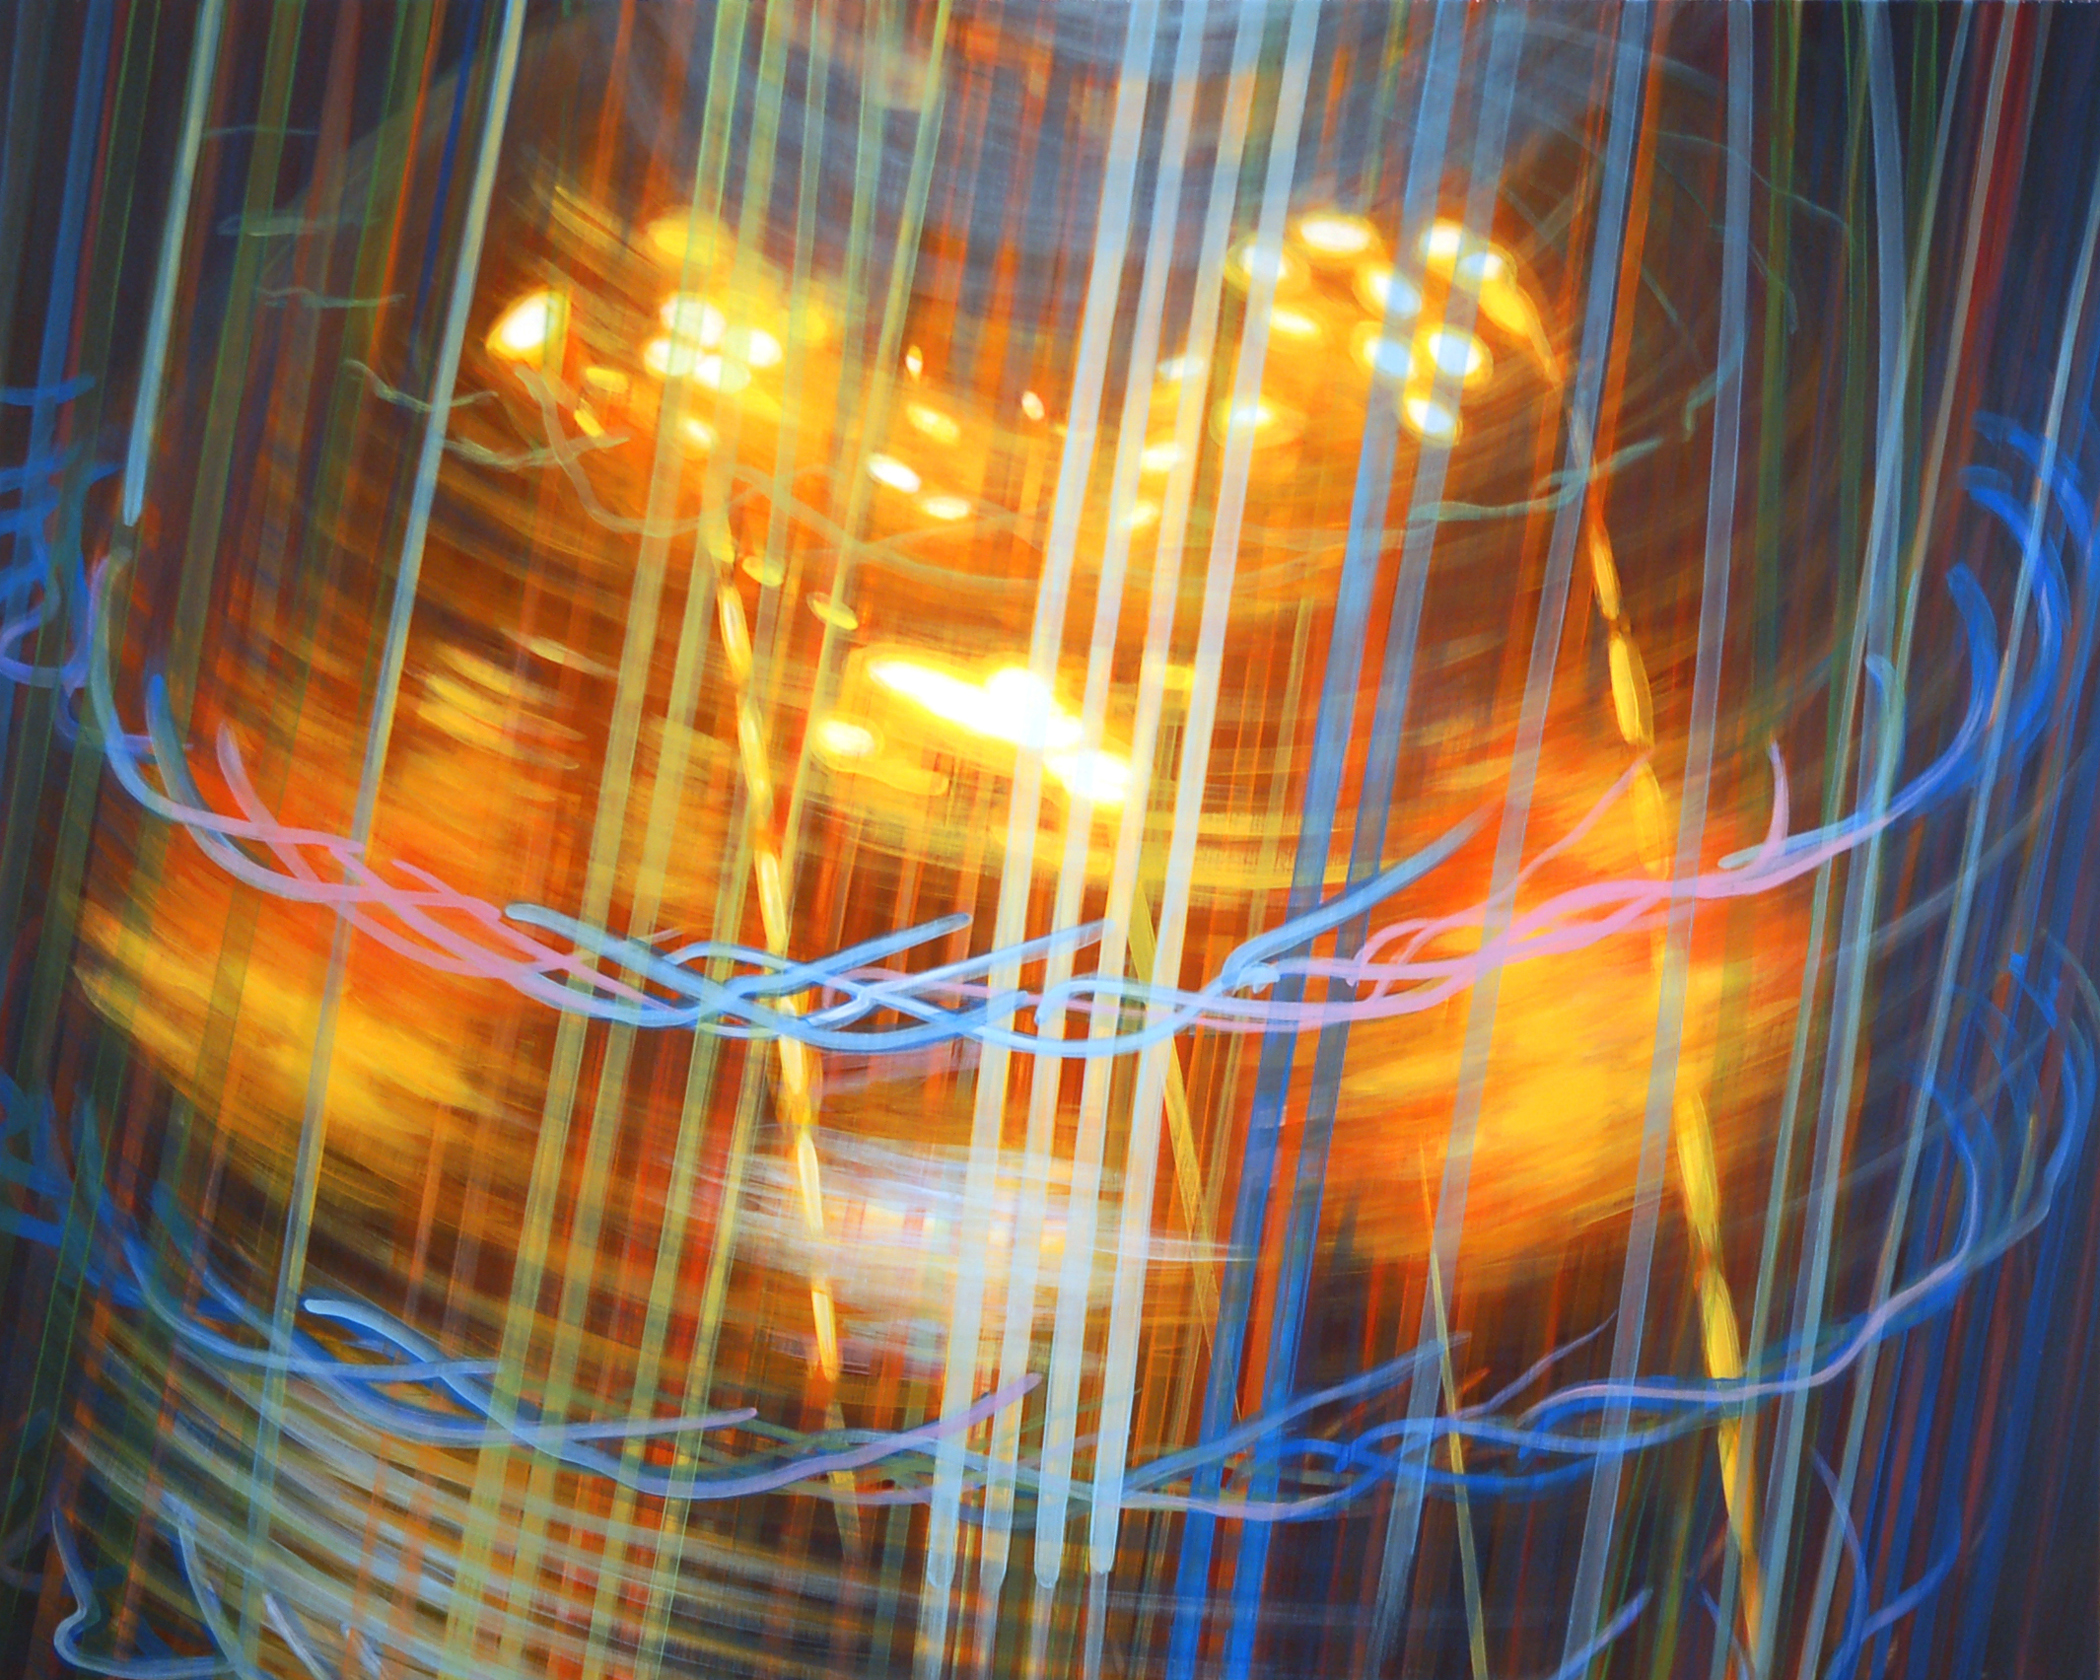 Body of Light I 2009 acrylic on board 36x45in